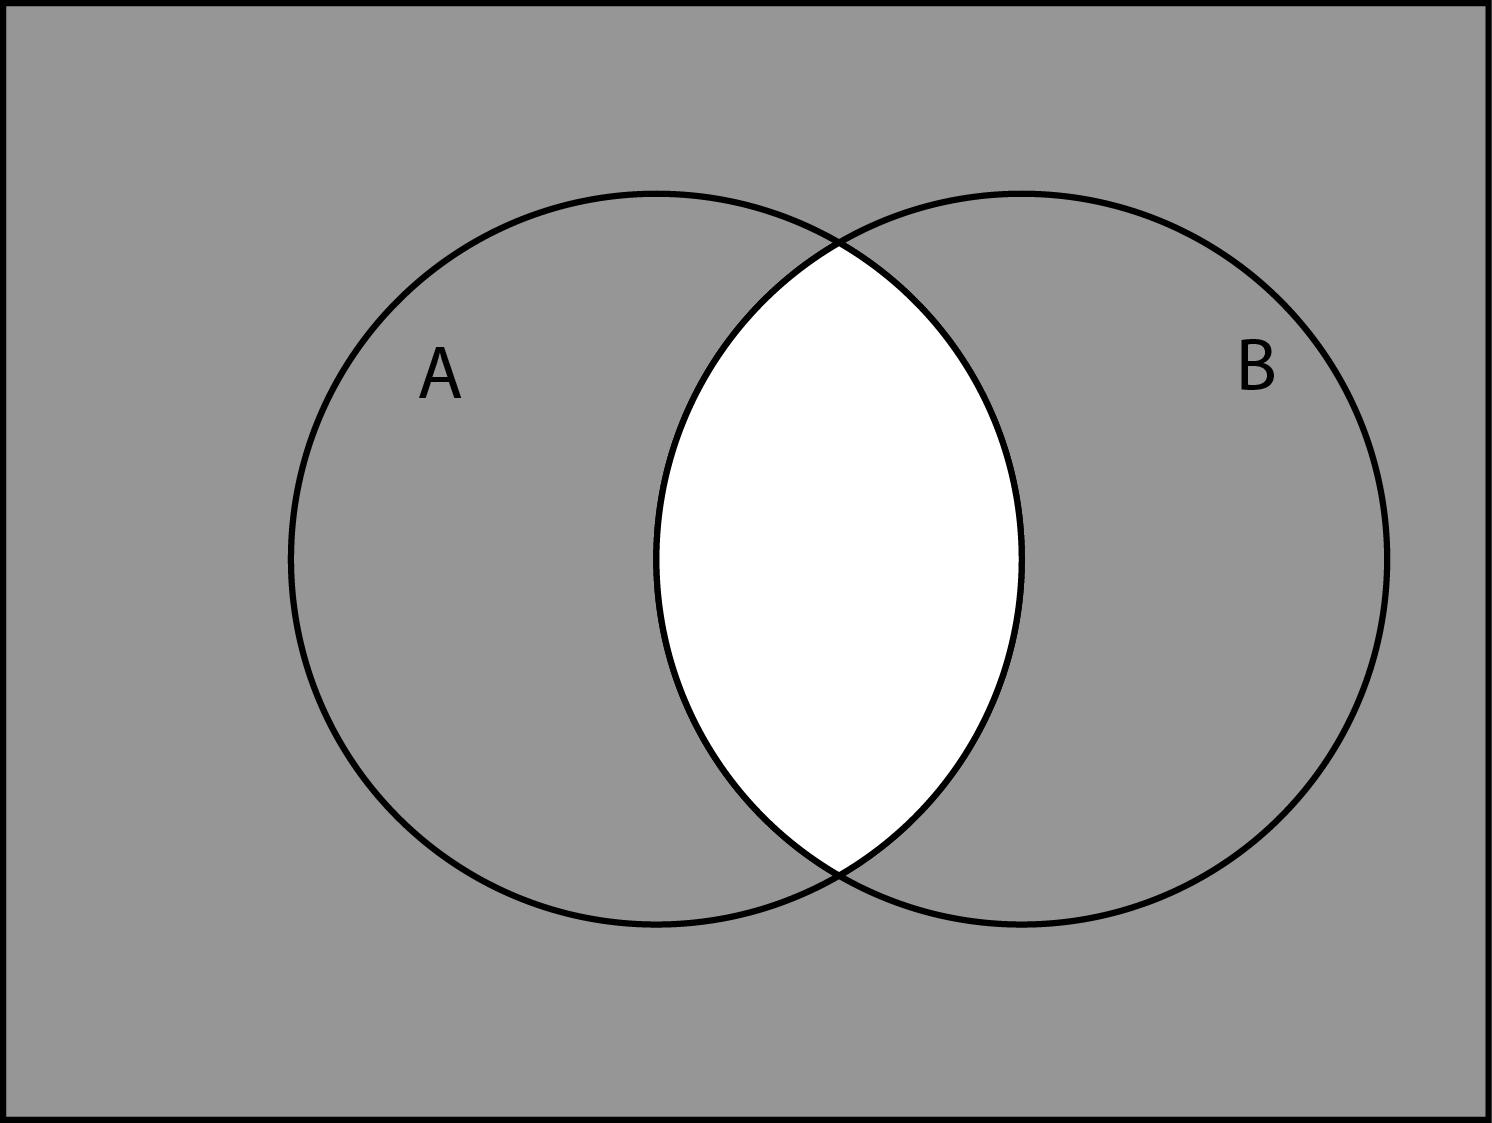 одном дизъюнкция круги эйлера картинки вариантами